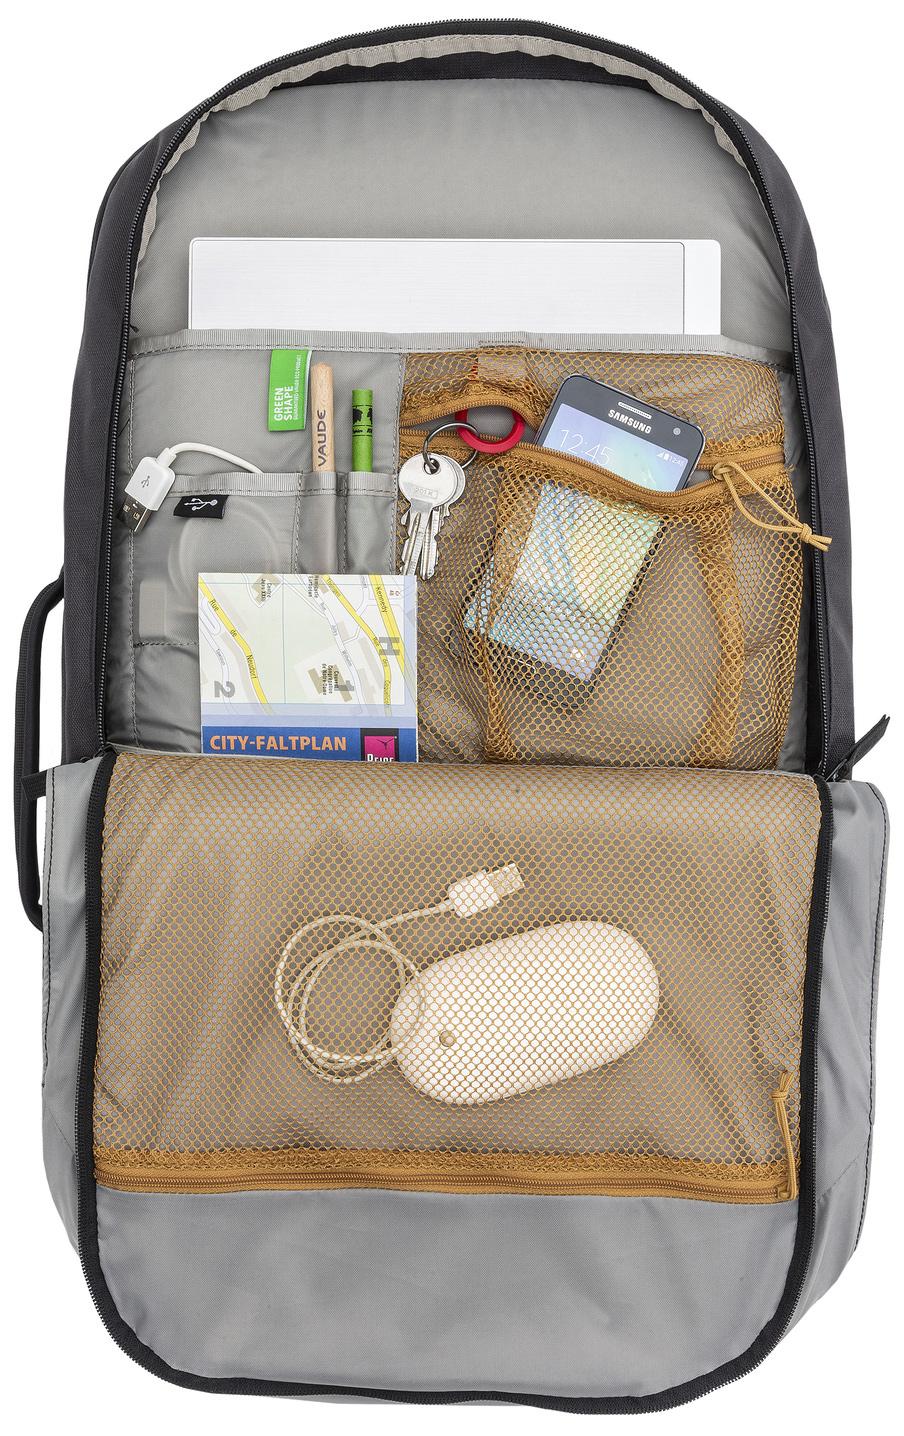 Image of Vaude Mundo Carry-On 38 Backpack - black